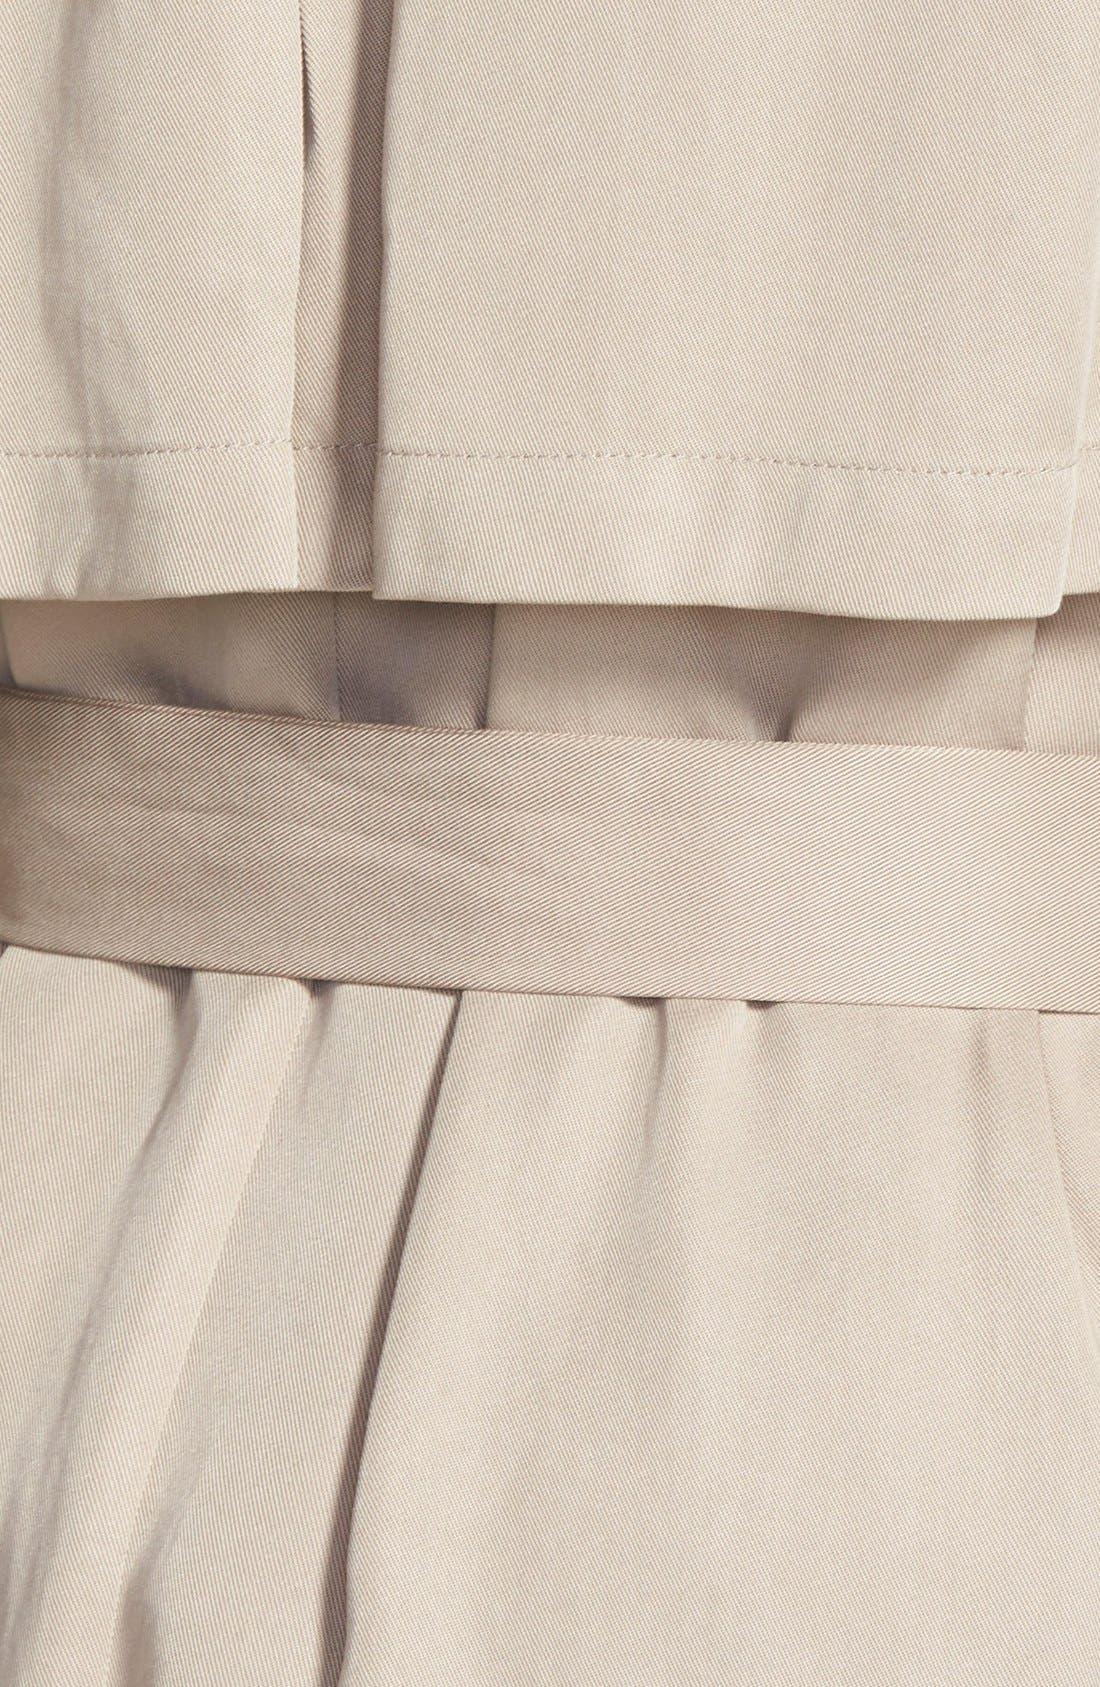 Draped Wrap Long Trench Coat,                             Alternate thumbnail 2, color,                             250